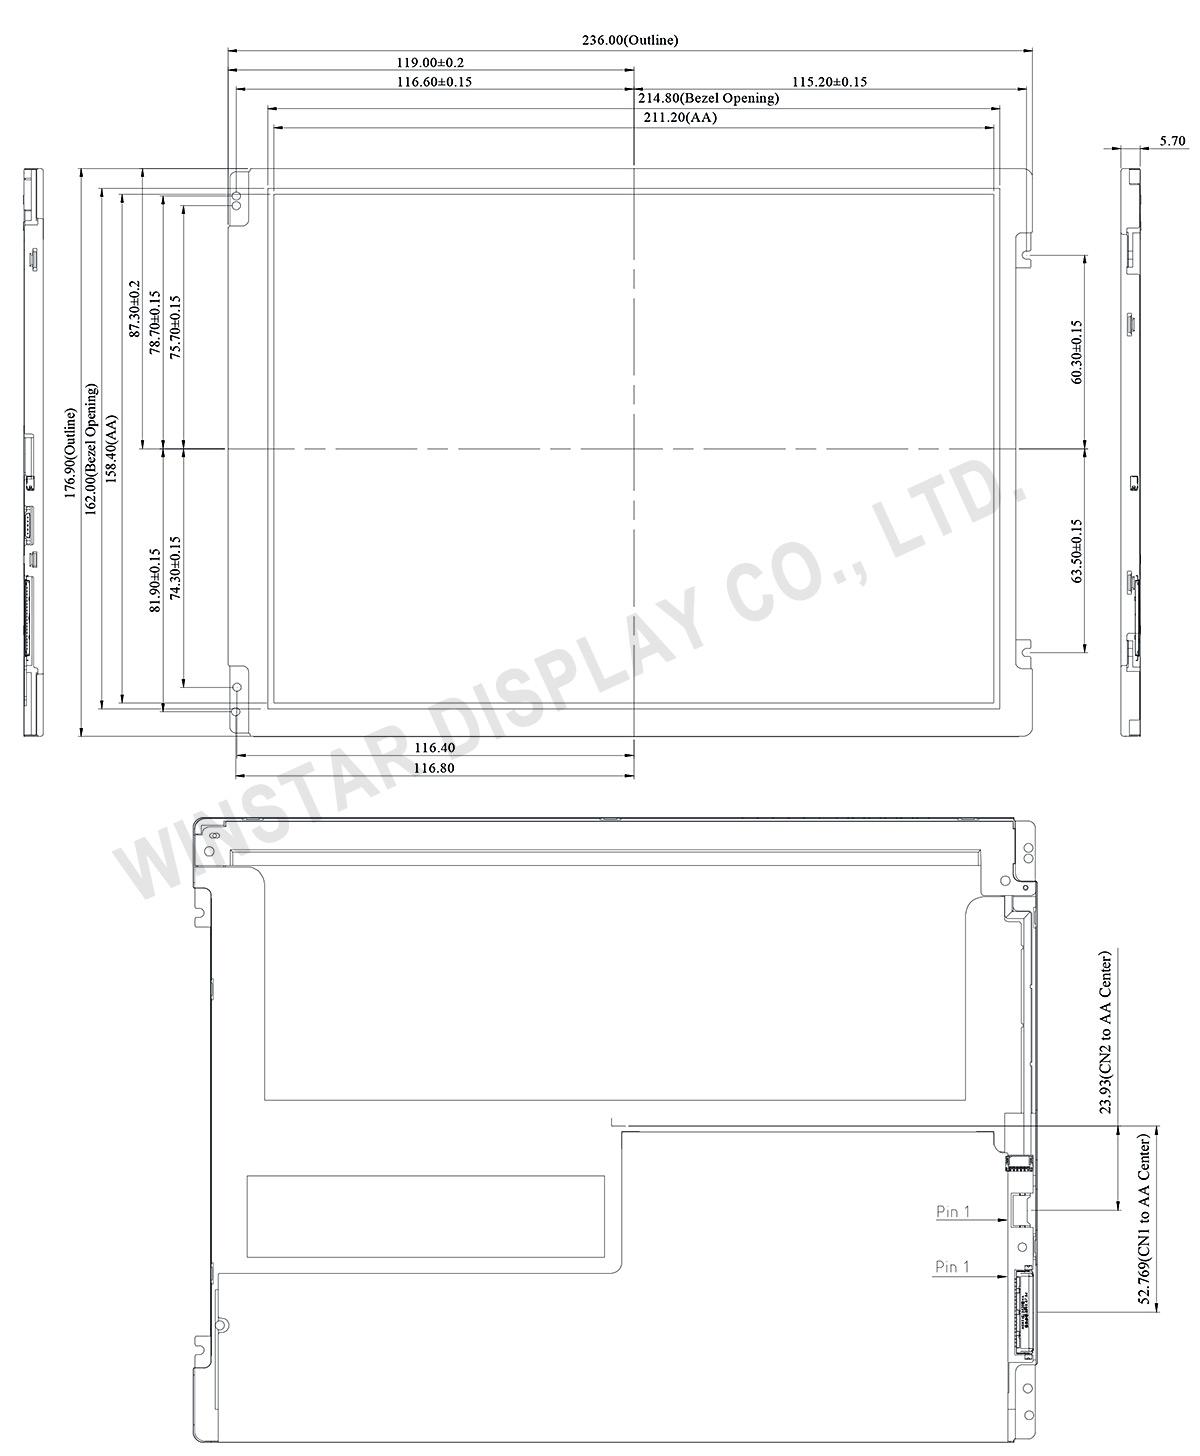 10.4 TFT LCD, 10.4 TFT Display, 10.4 inch LCD Display - Winstar Display